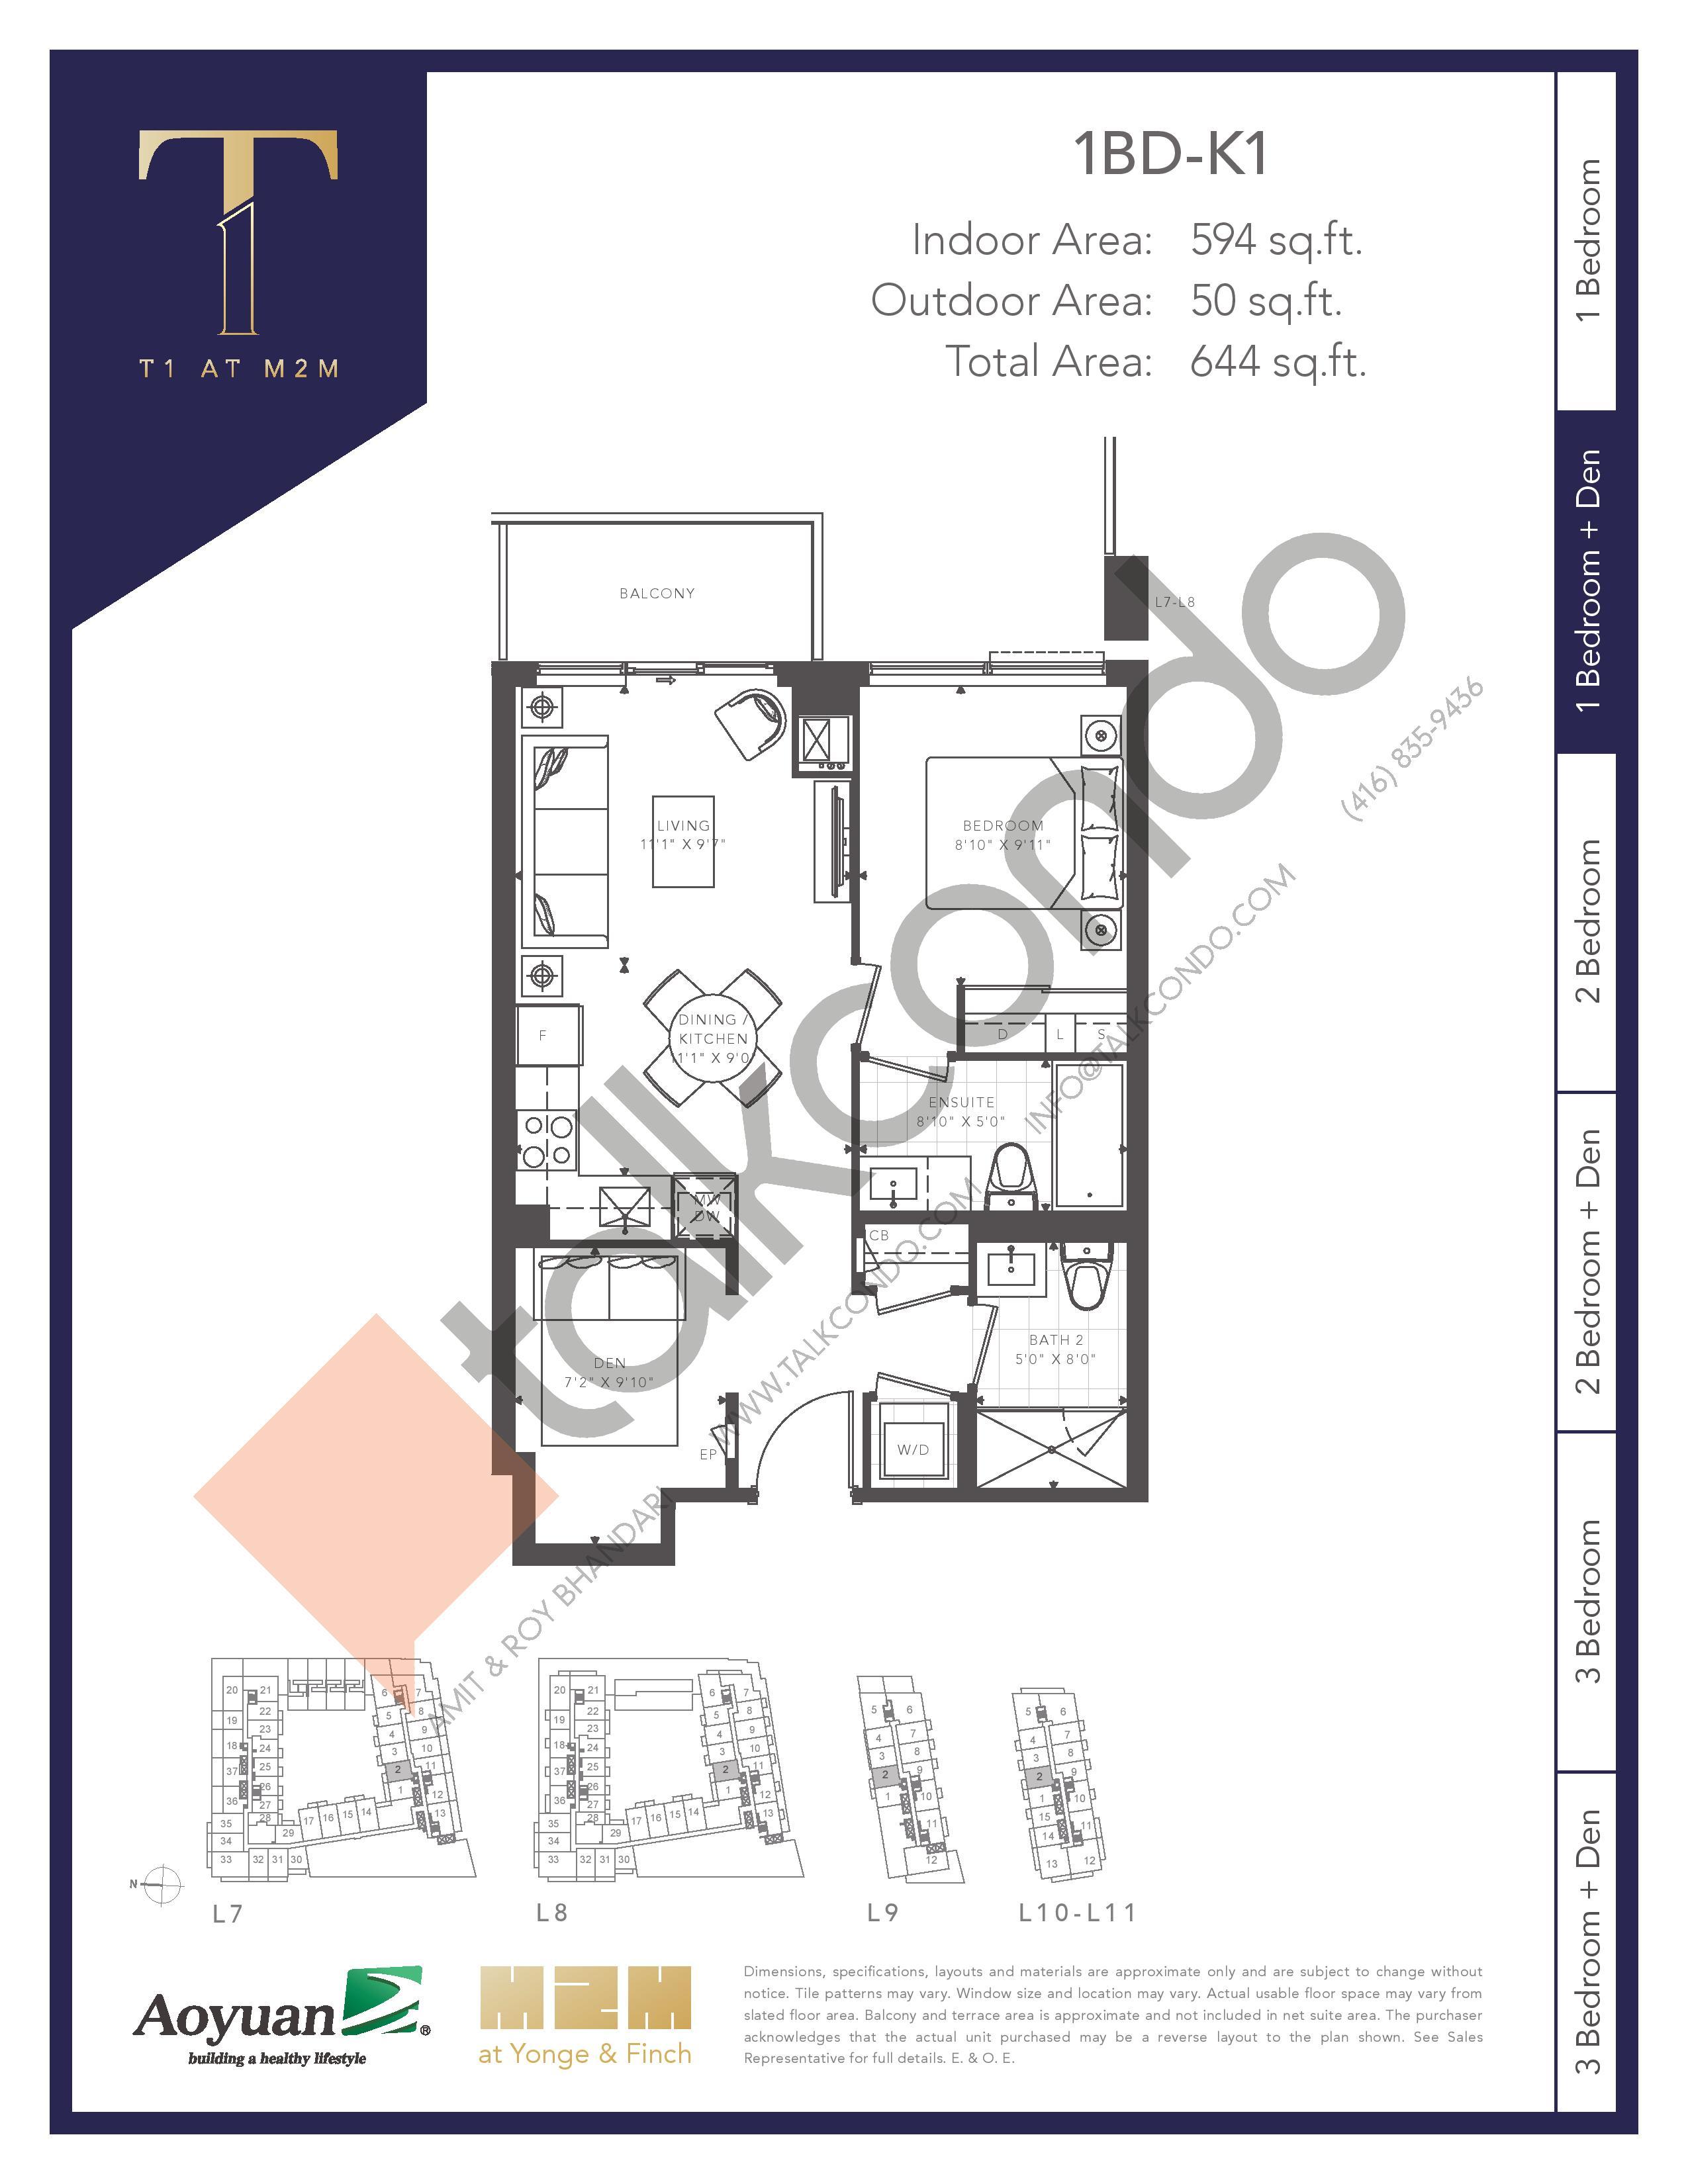 1BD-K1 (Tower) Floor Plan at T1 at M2M Condos - 594 sq.ft